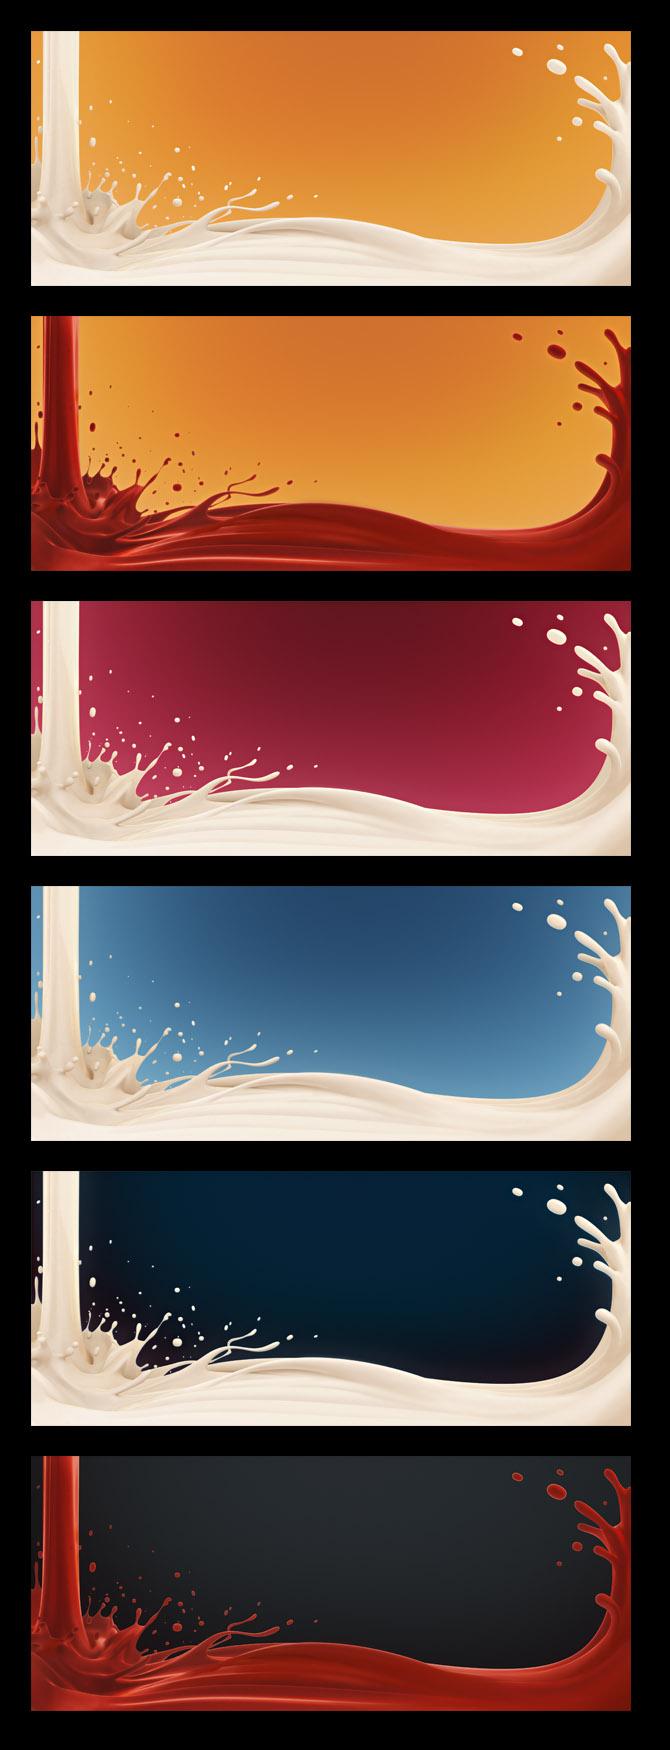 Splash - 3760x1600 wallpaper